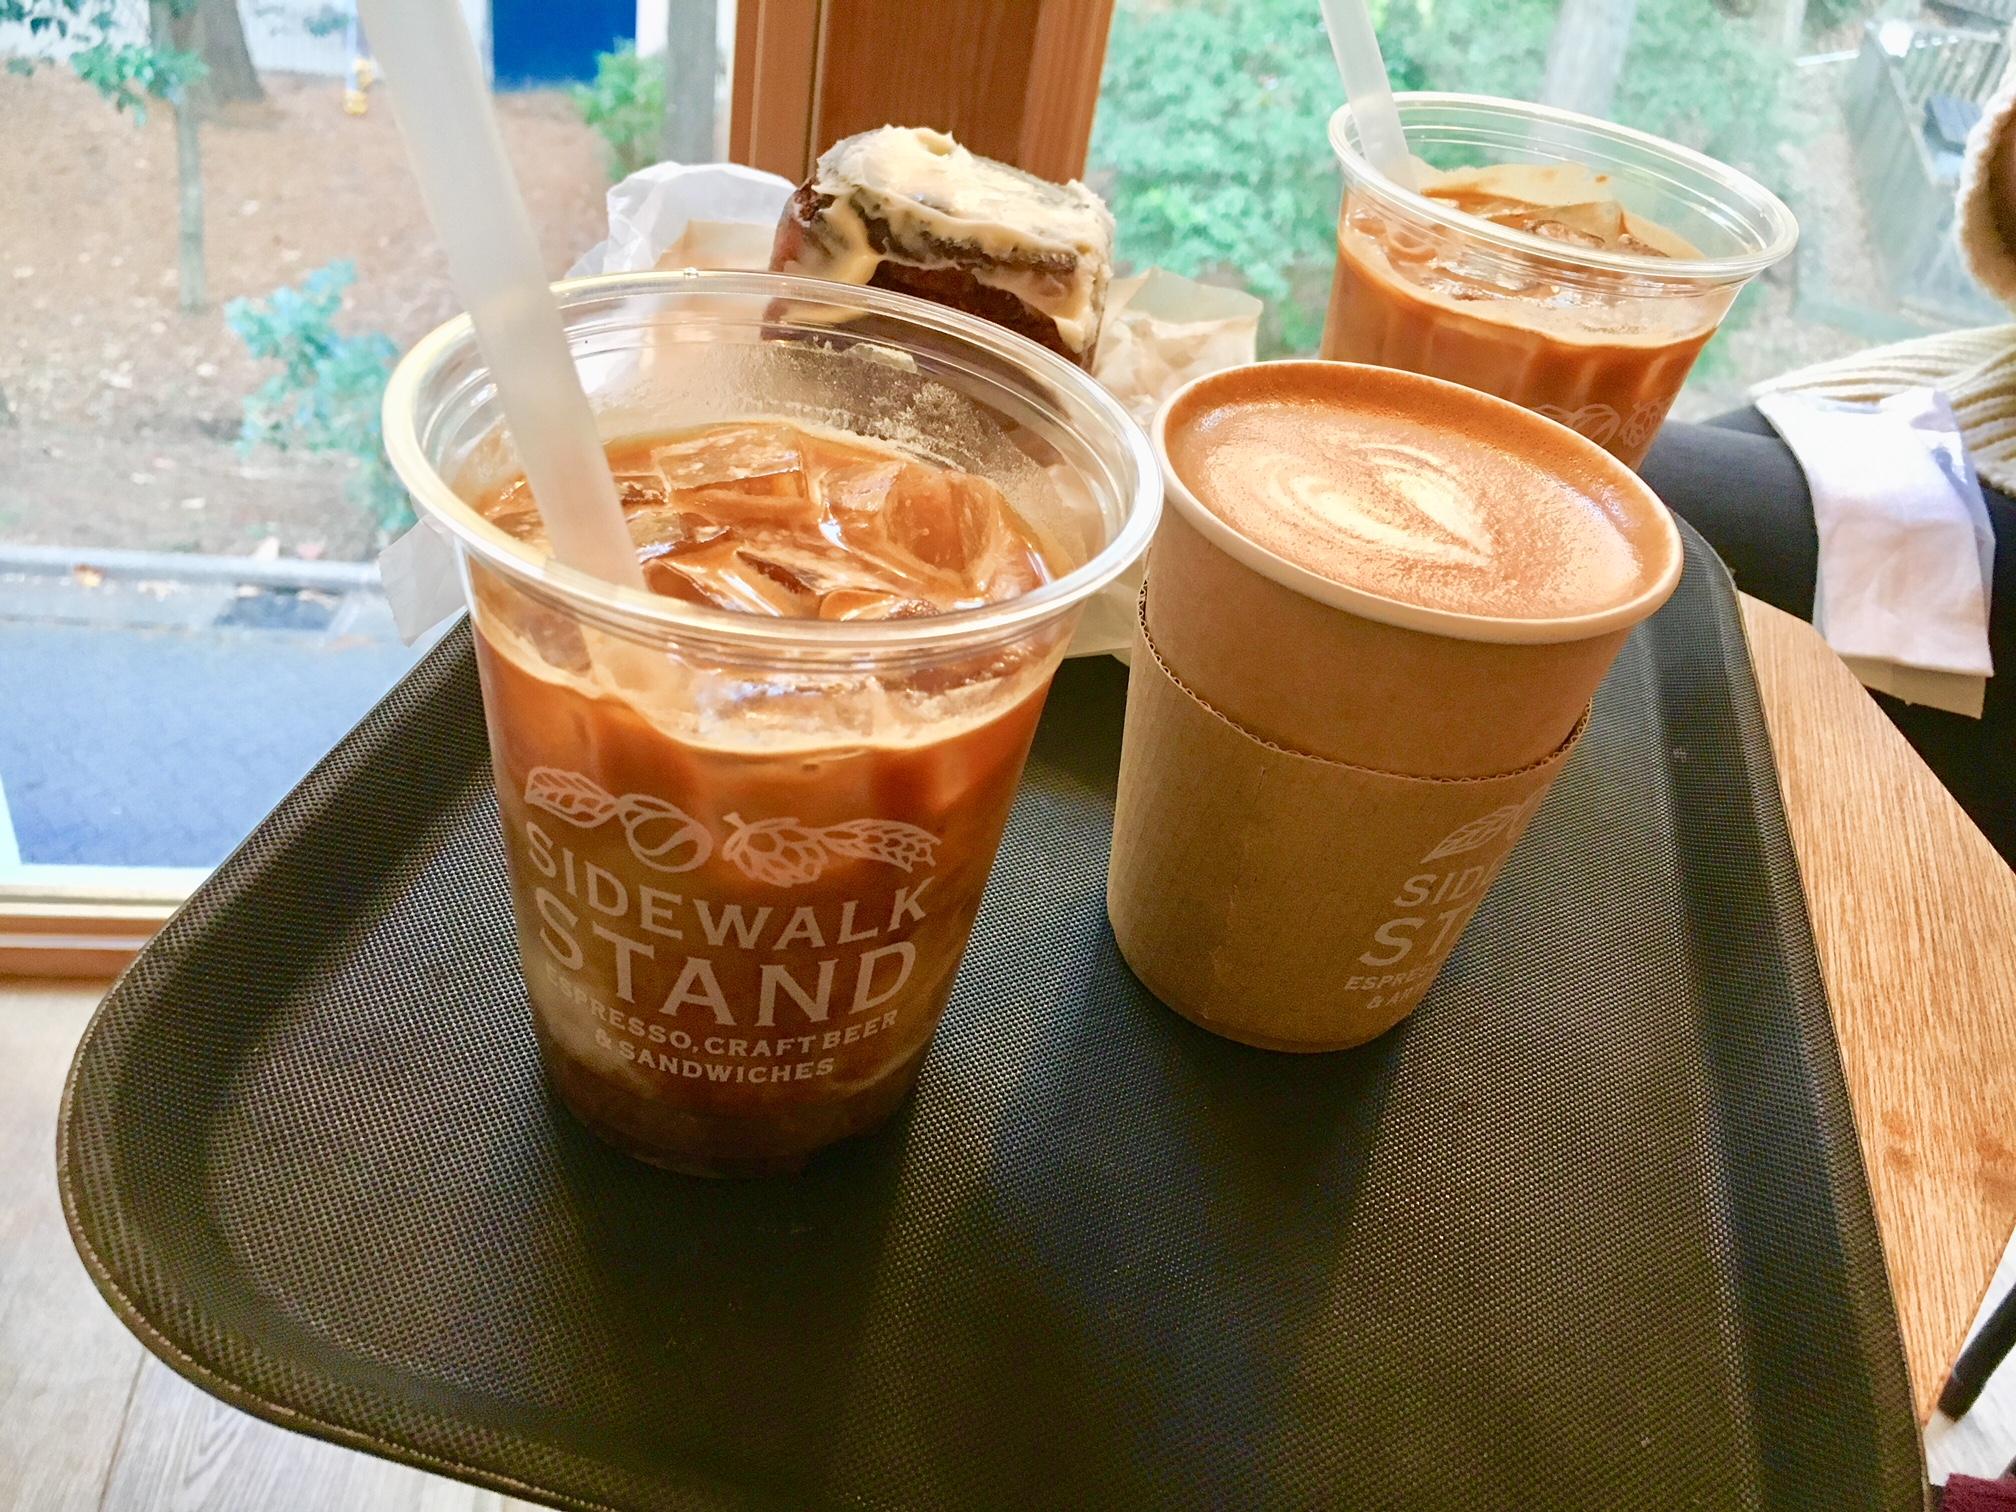 SIDEWALK STAND INOKASHIRAのコーヒーの画像